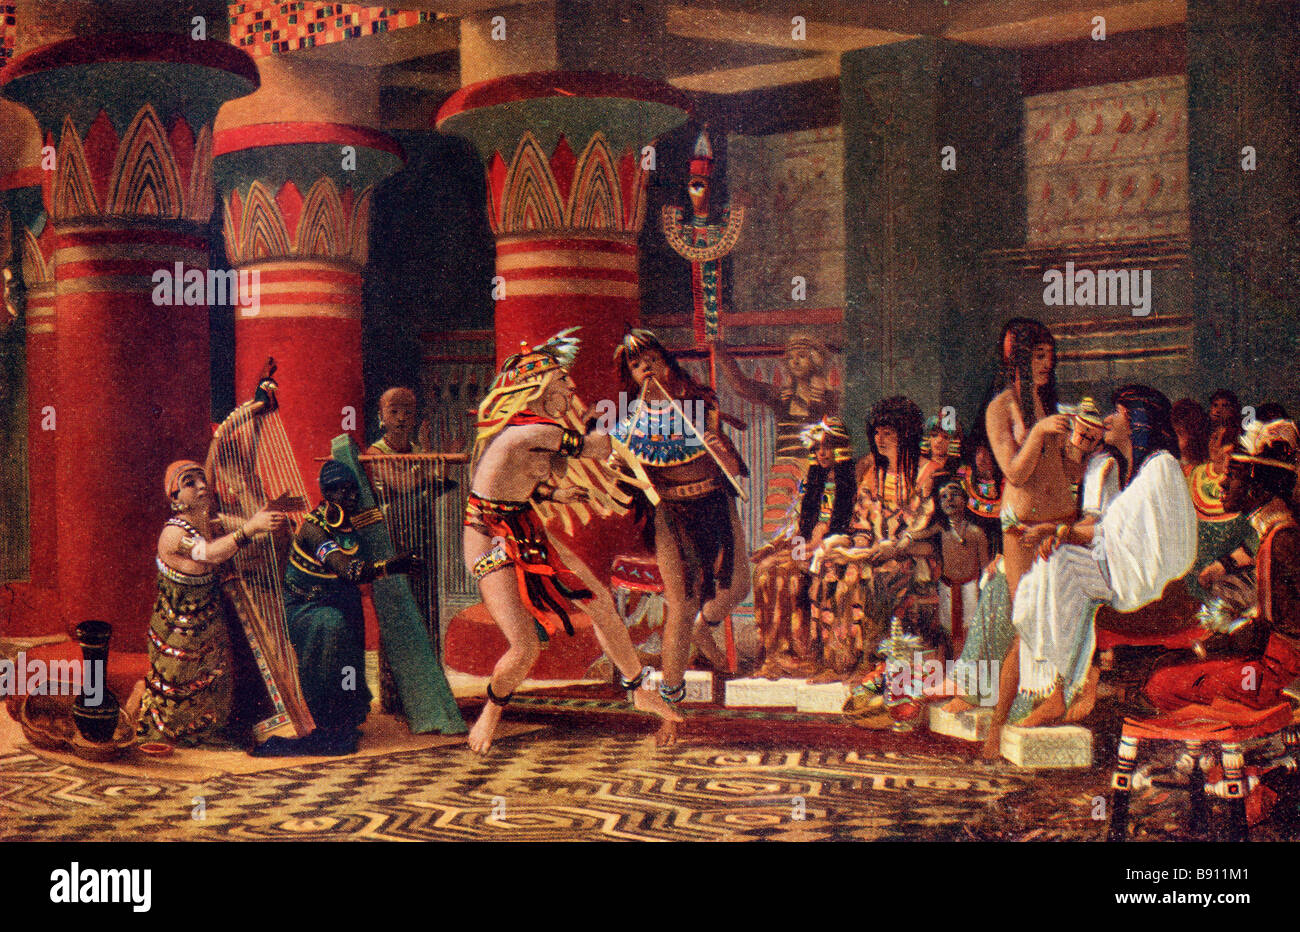 Ancient Egypt Dancing Stock Photos & Ancient Egypt Dancing Stock ...